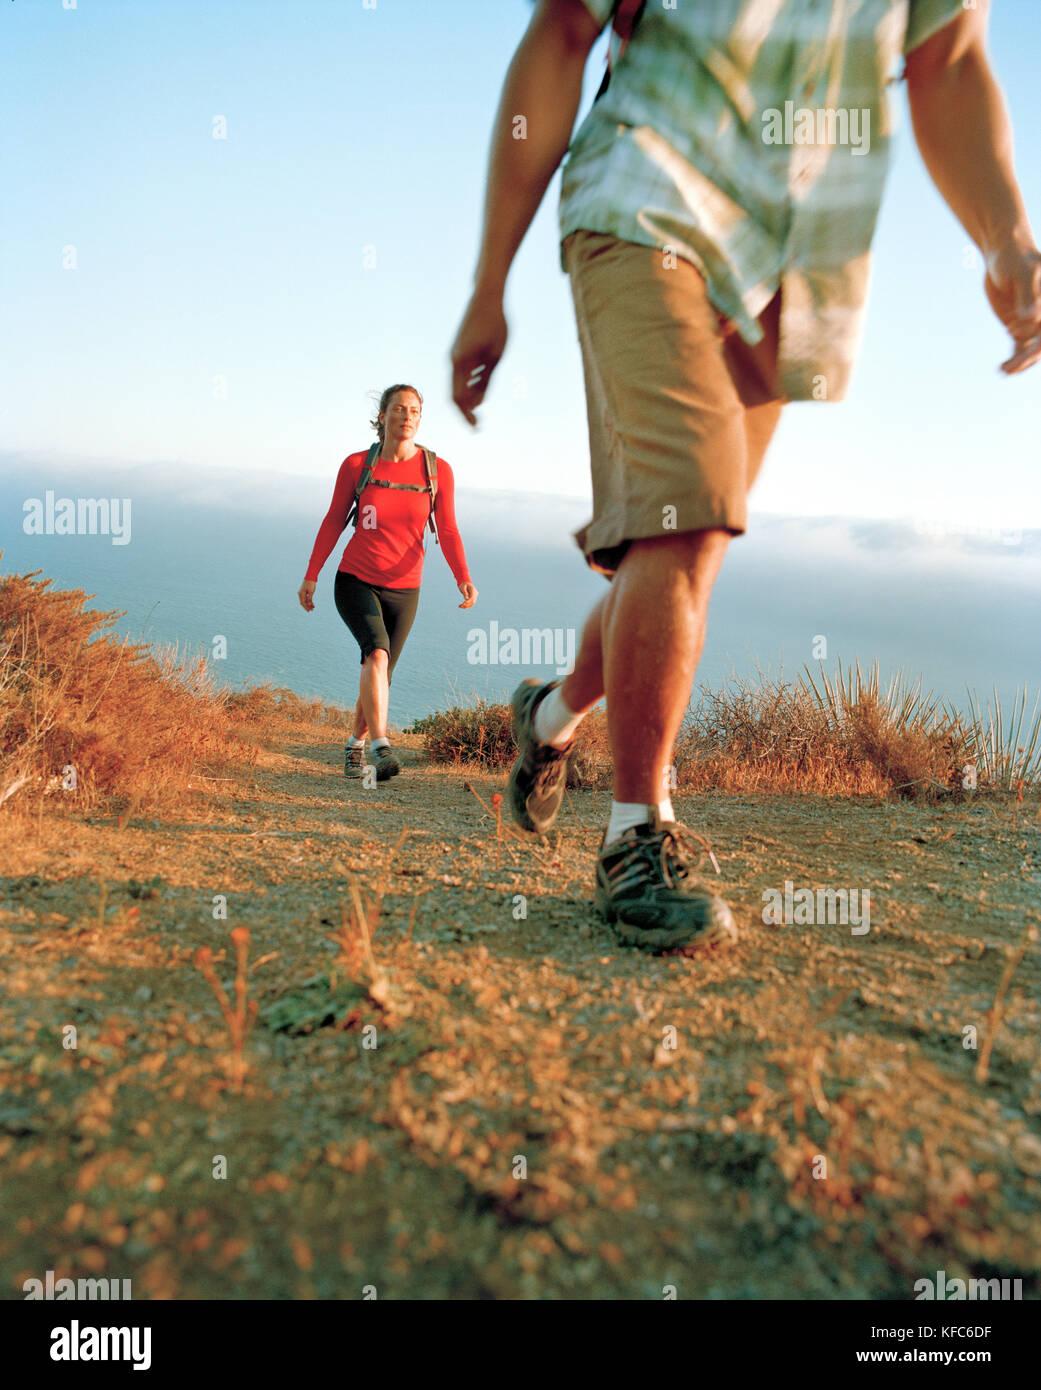 USA, California, Malibu, hiking the coastal Chumash Trail above the Pacific Ocean, Point Mugu State Park - Stock Image